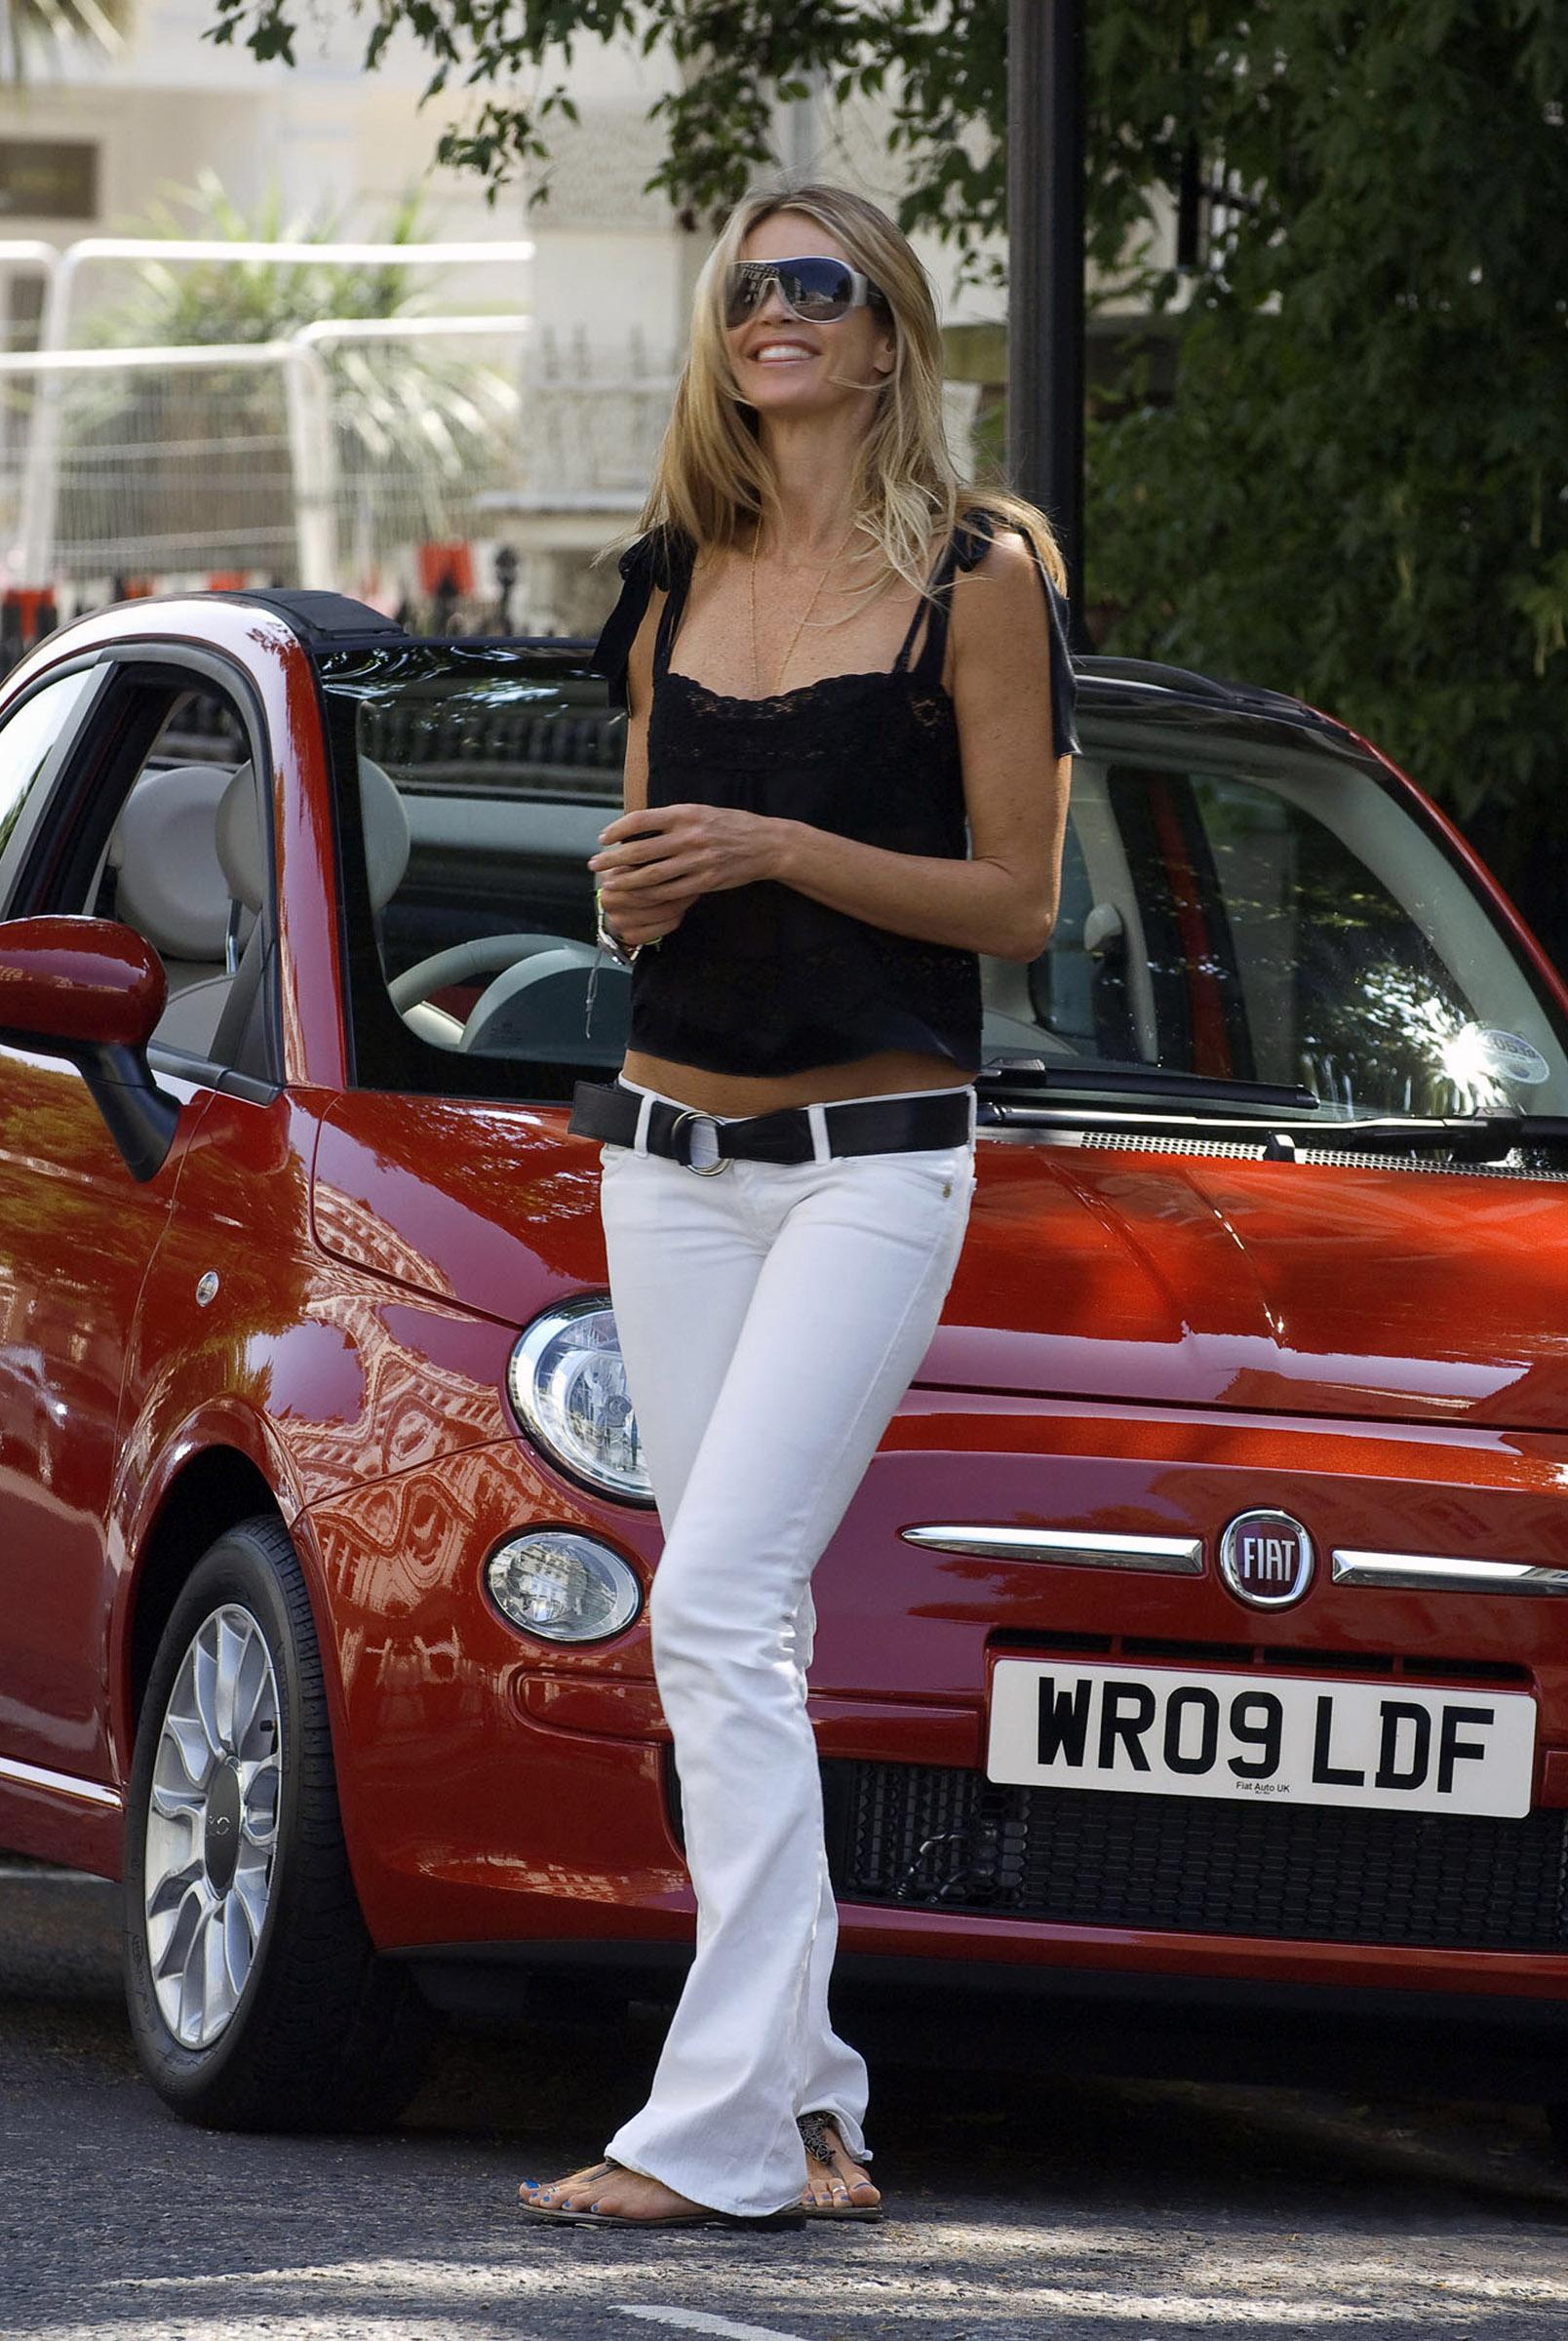 photo of Elle Macpherson Fiat 500 - car